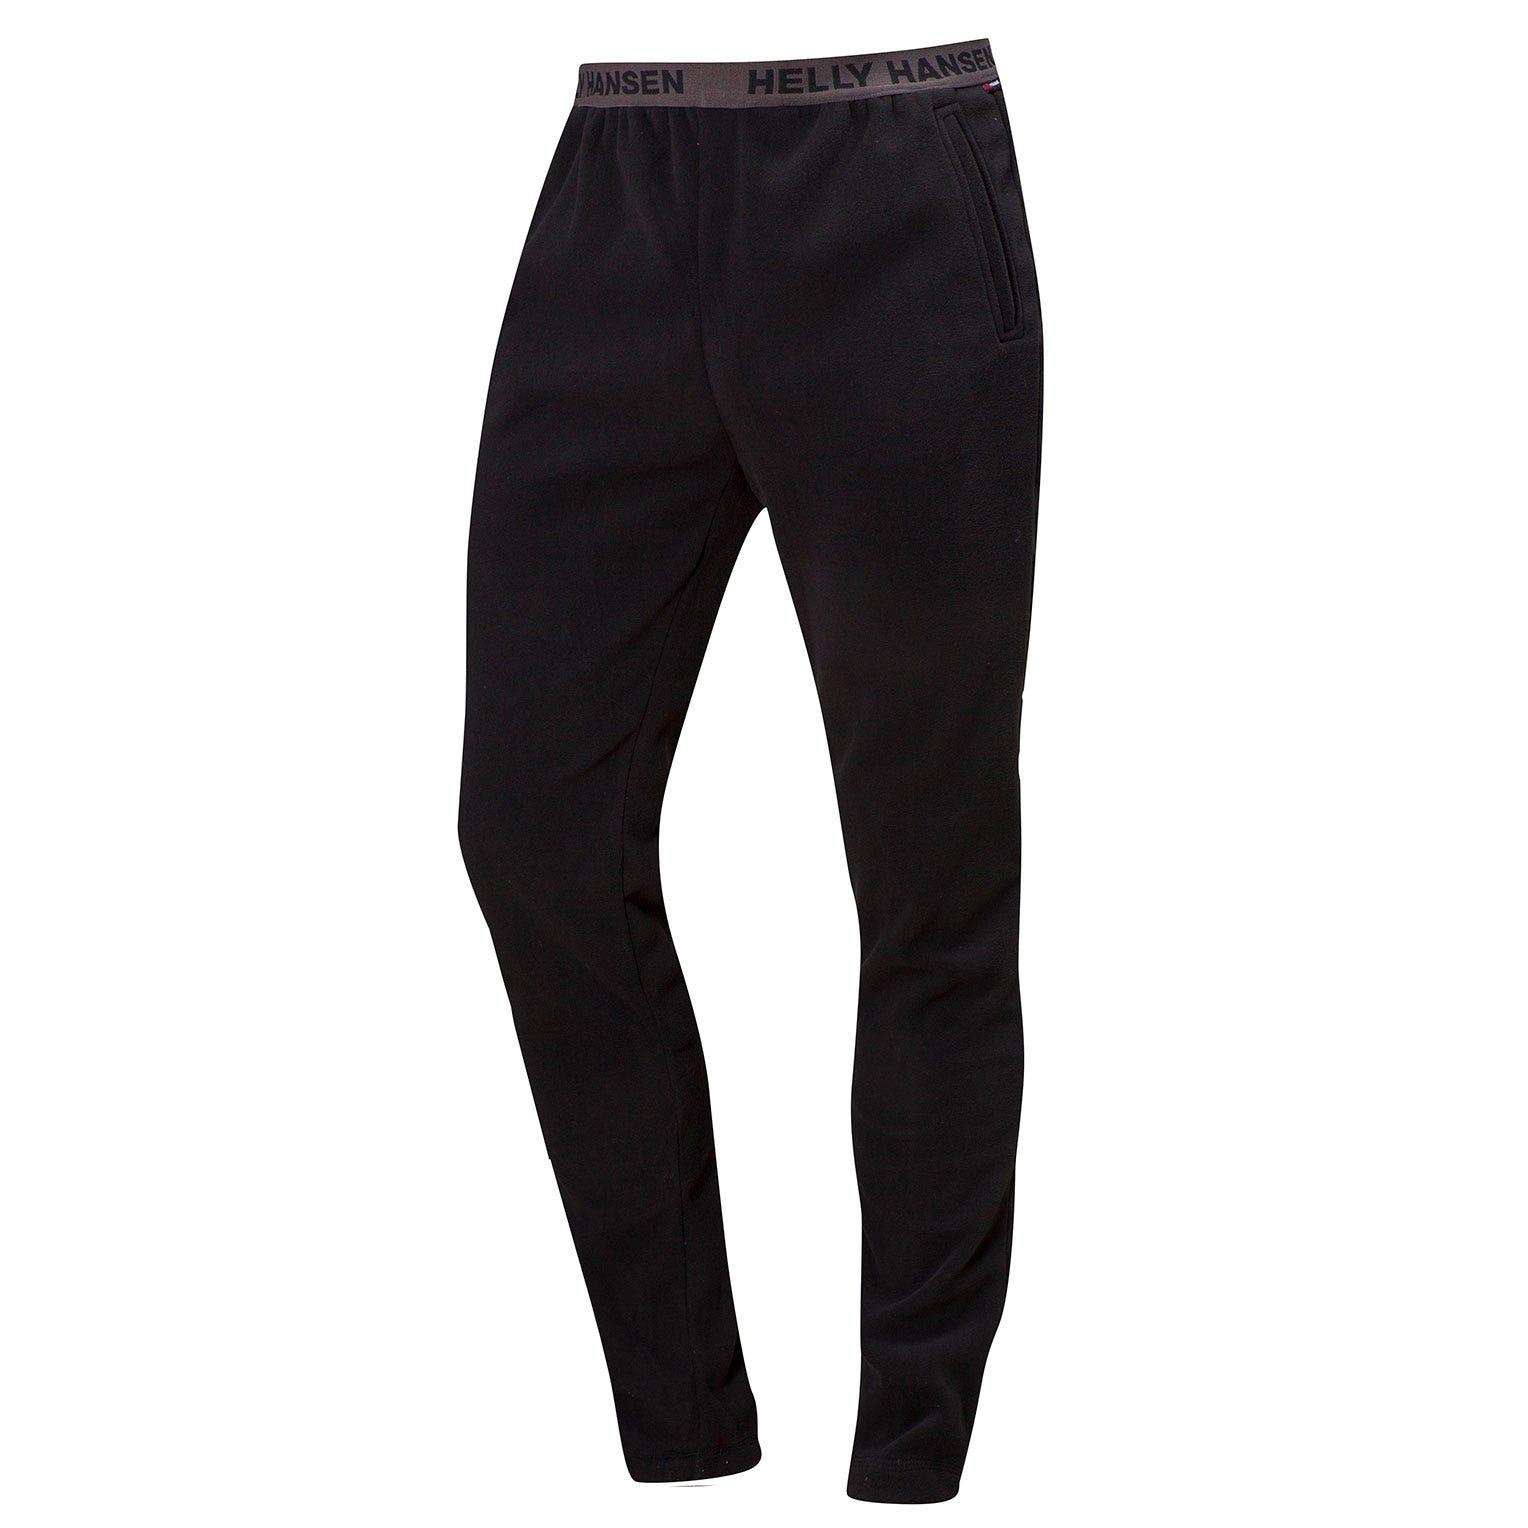 Helly Hansen Daybreaker Fleece Pant Mens Black XL